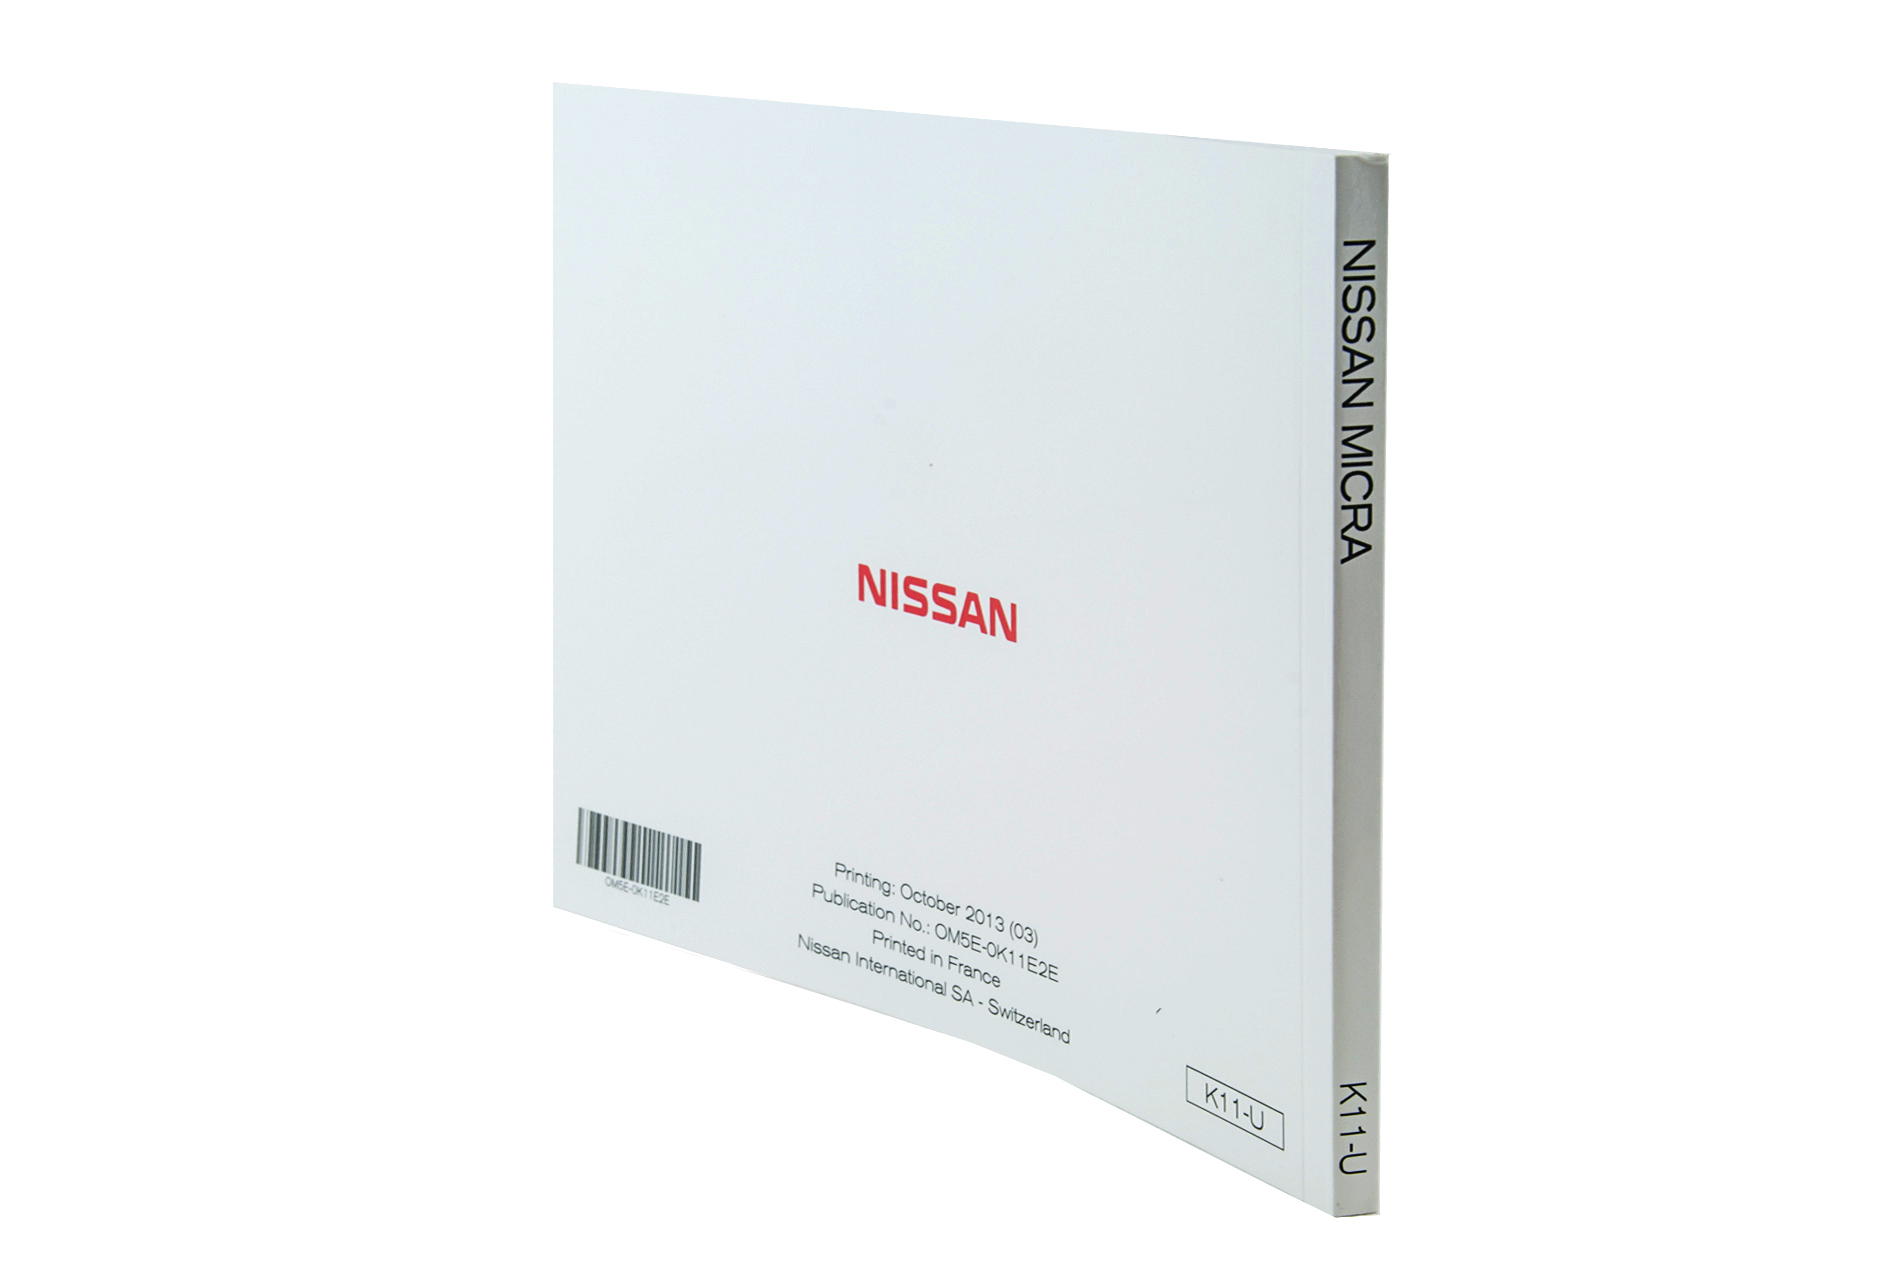 nissan genuine micra k11 owners manual user guide handbook